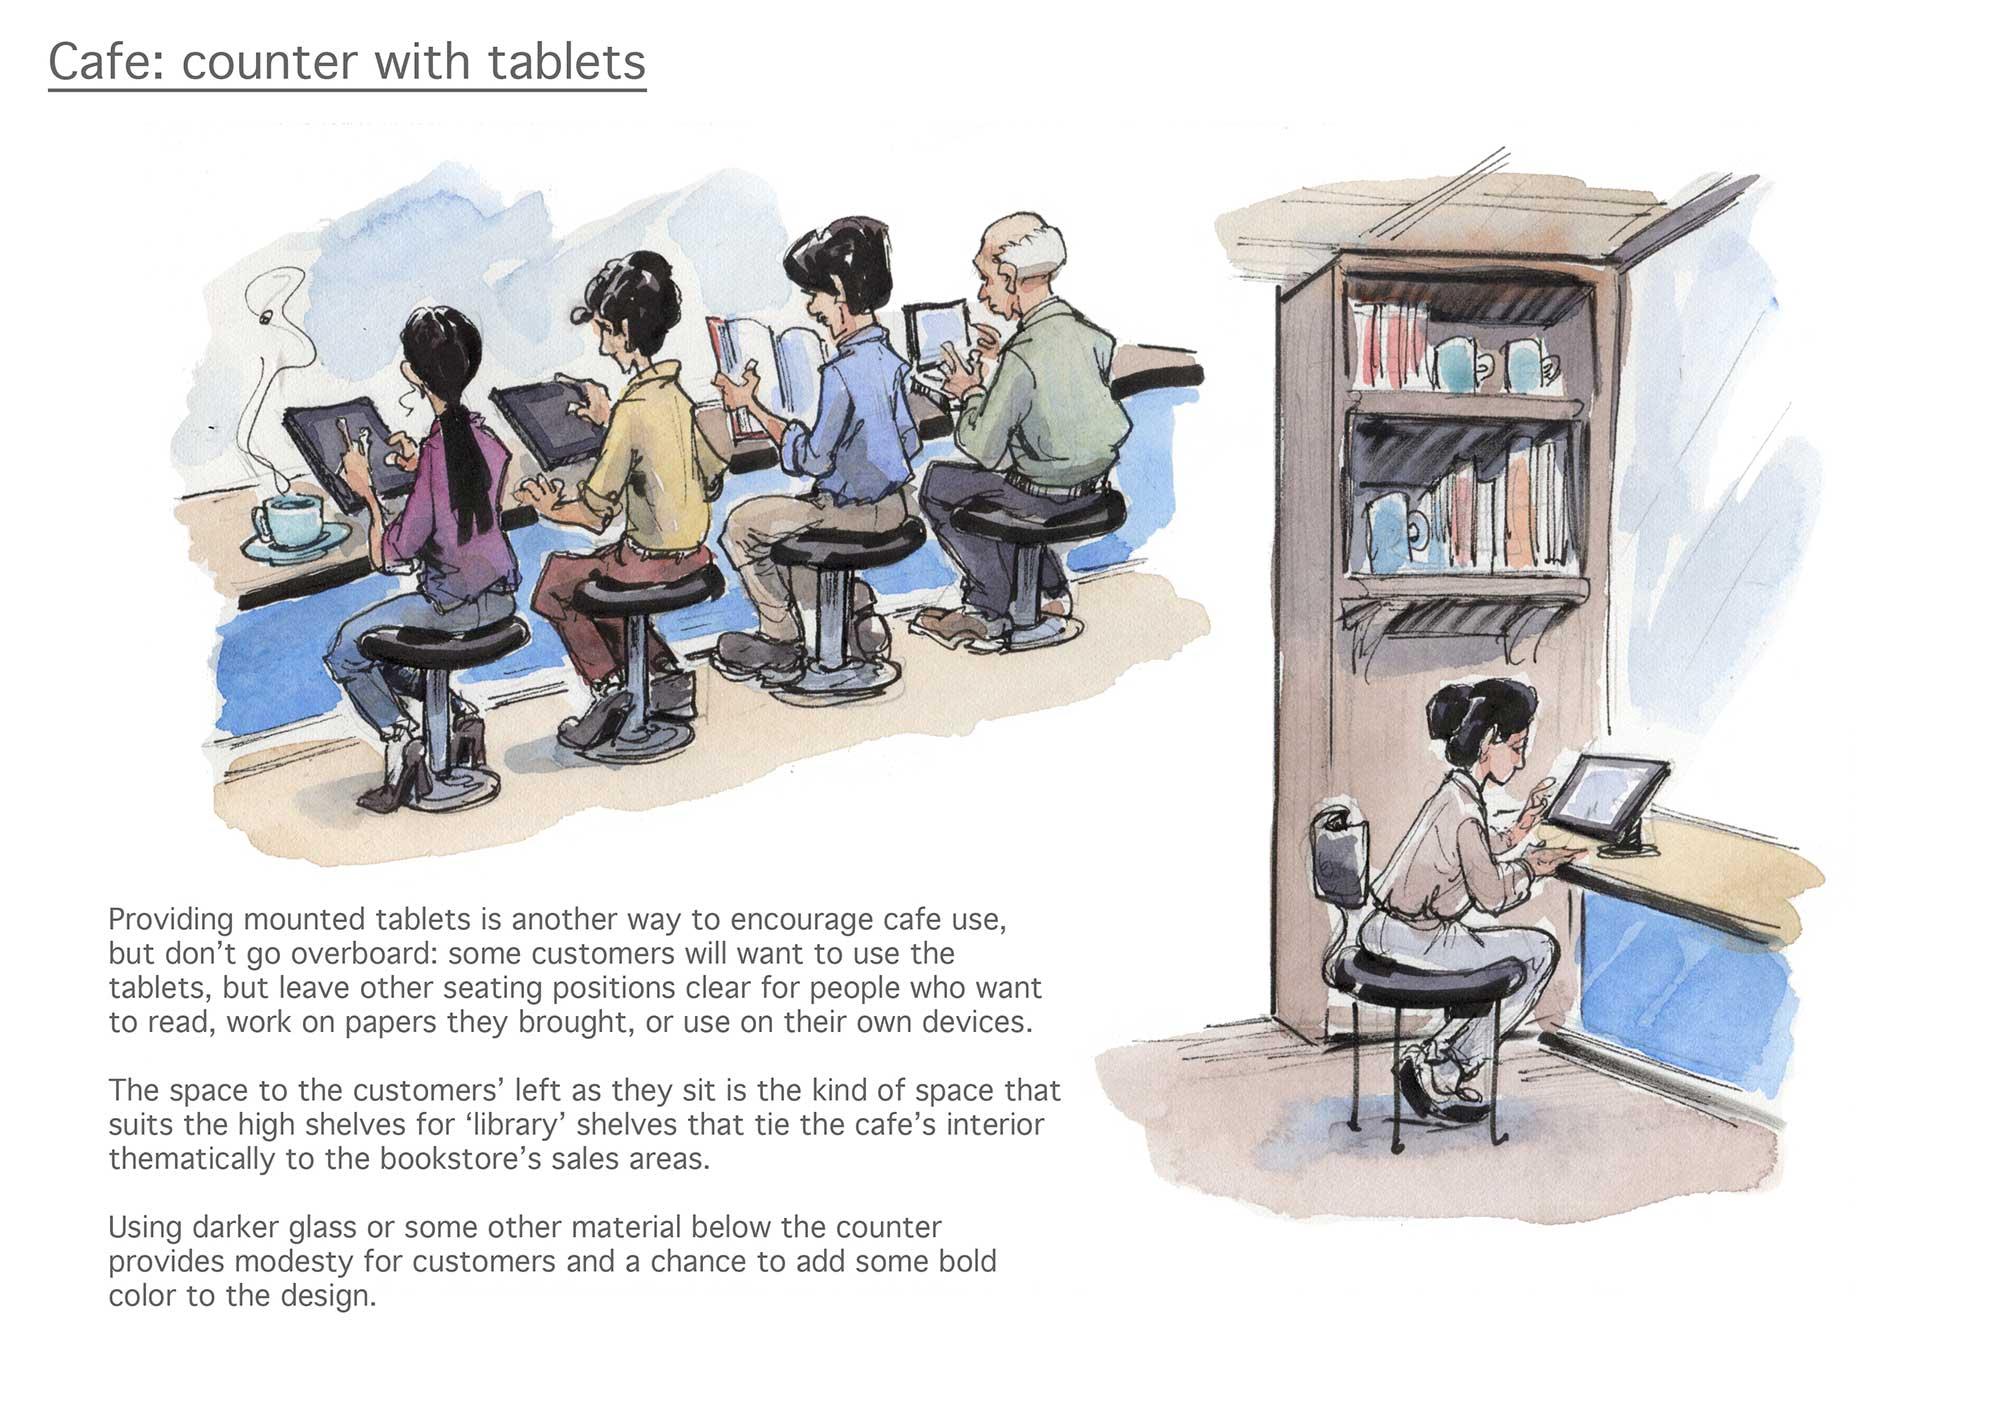 counter_tablets.jpg